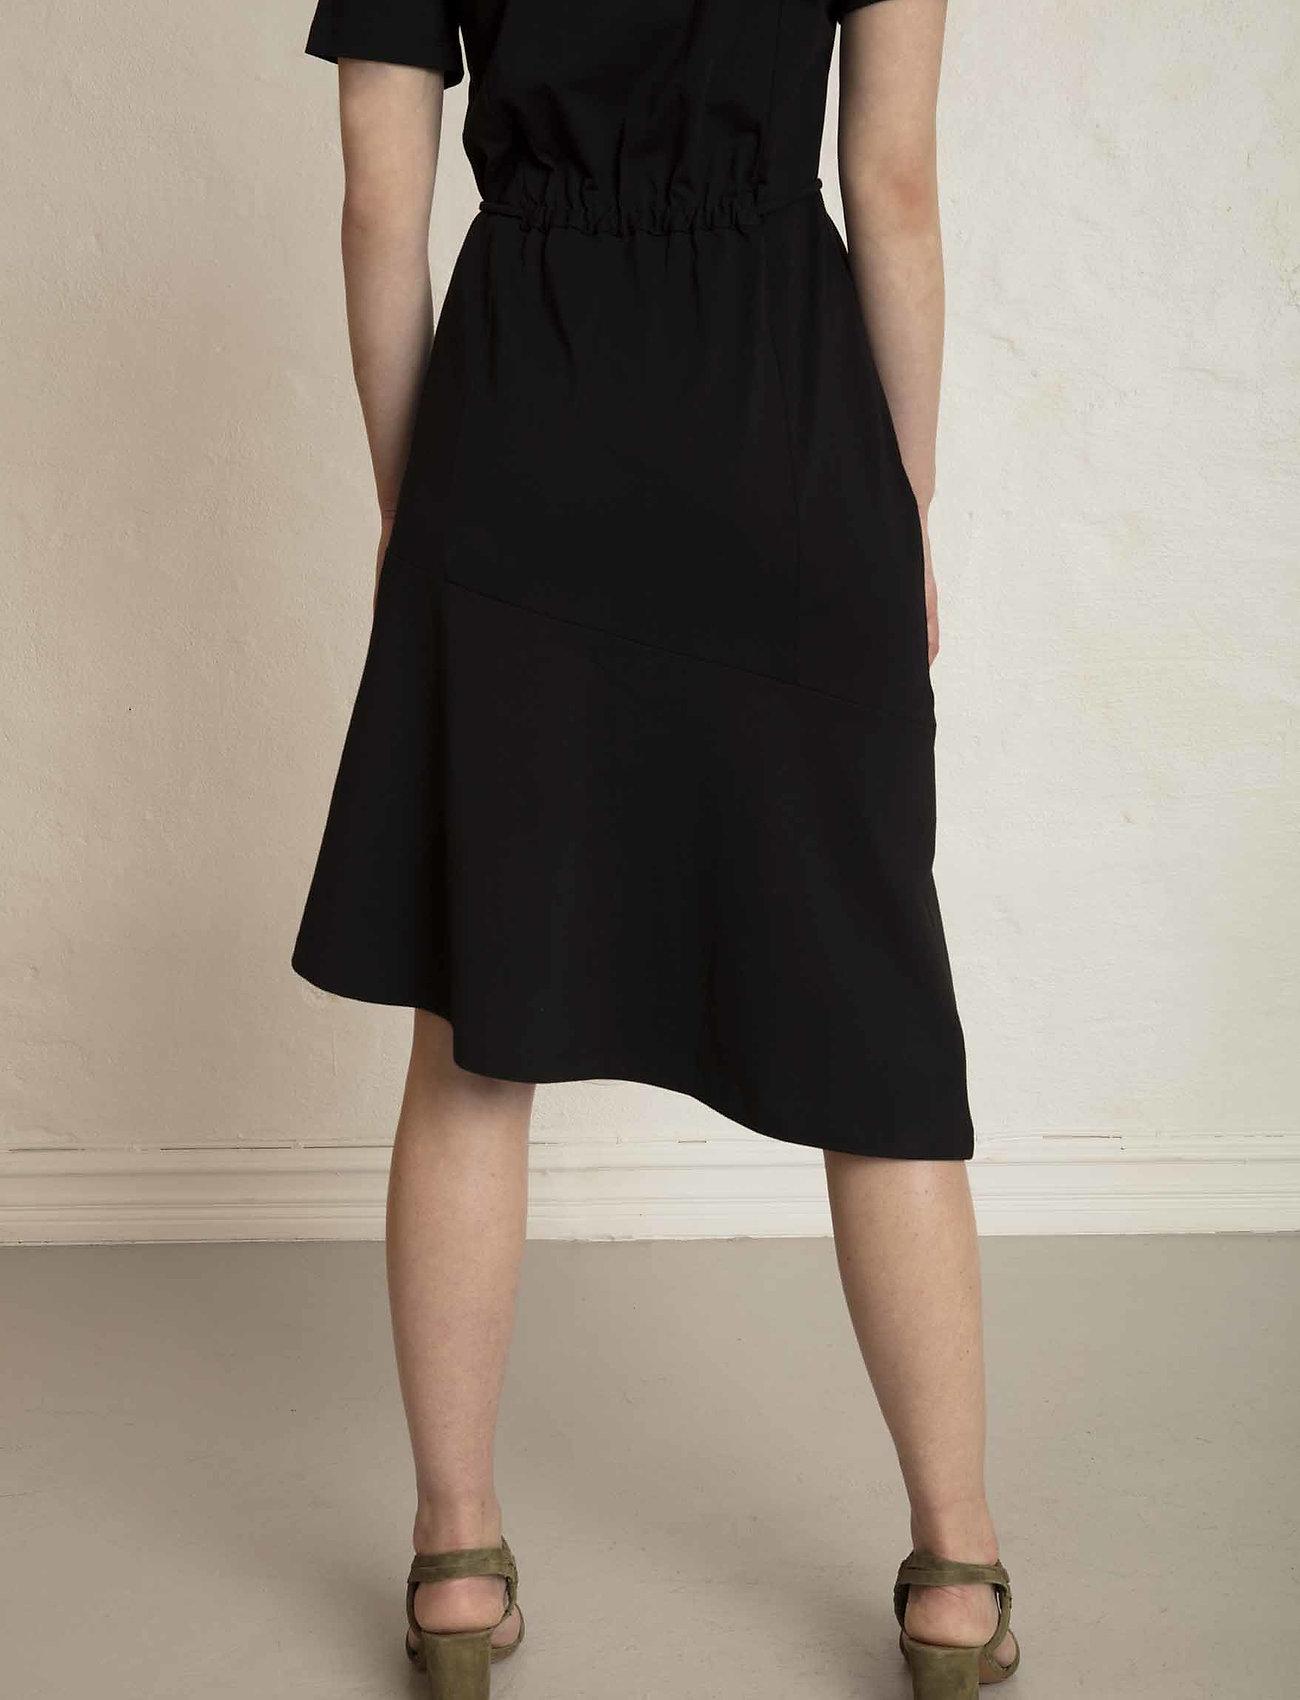 Residus OLIVIA ORGANIC COTTON TEE DRESS - Kleider BLACK - Damen Kleidung